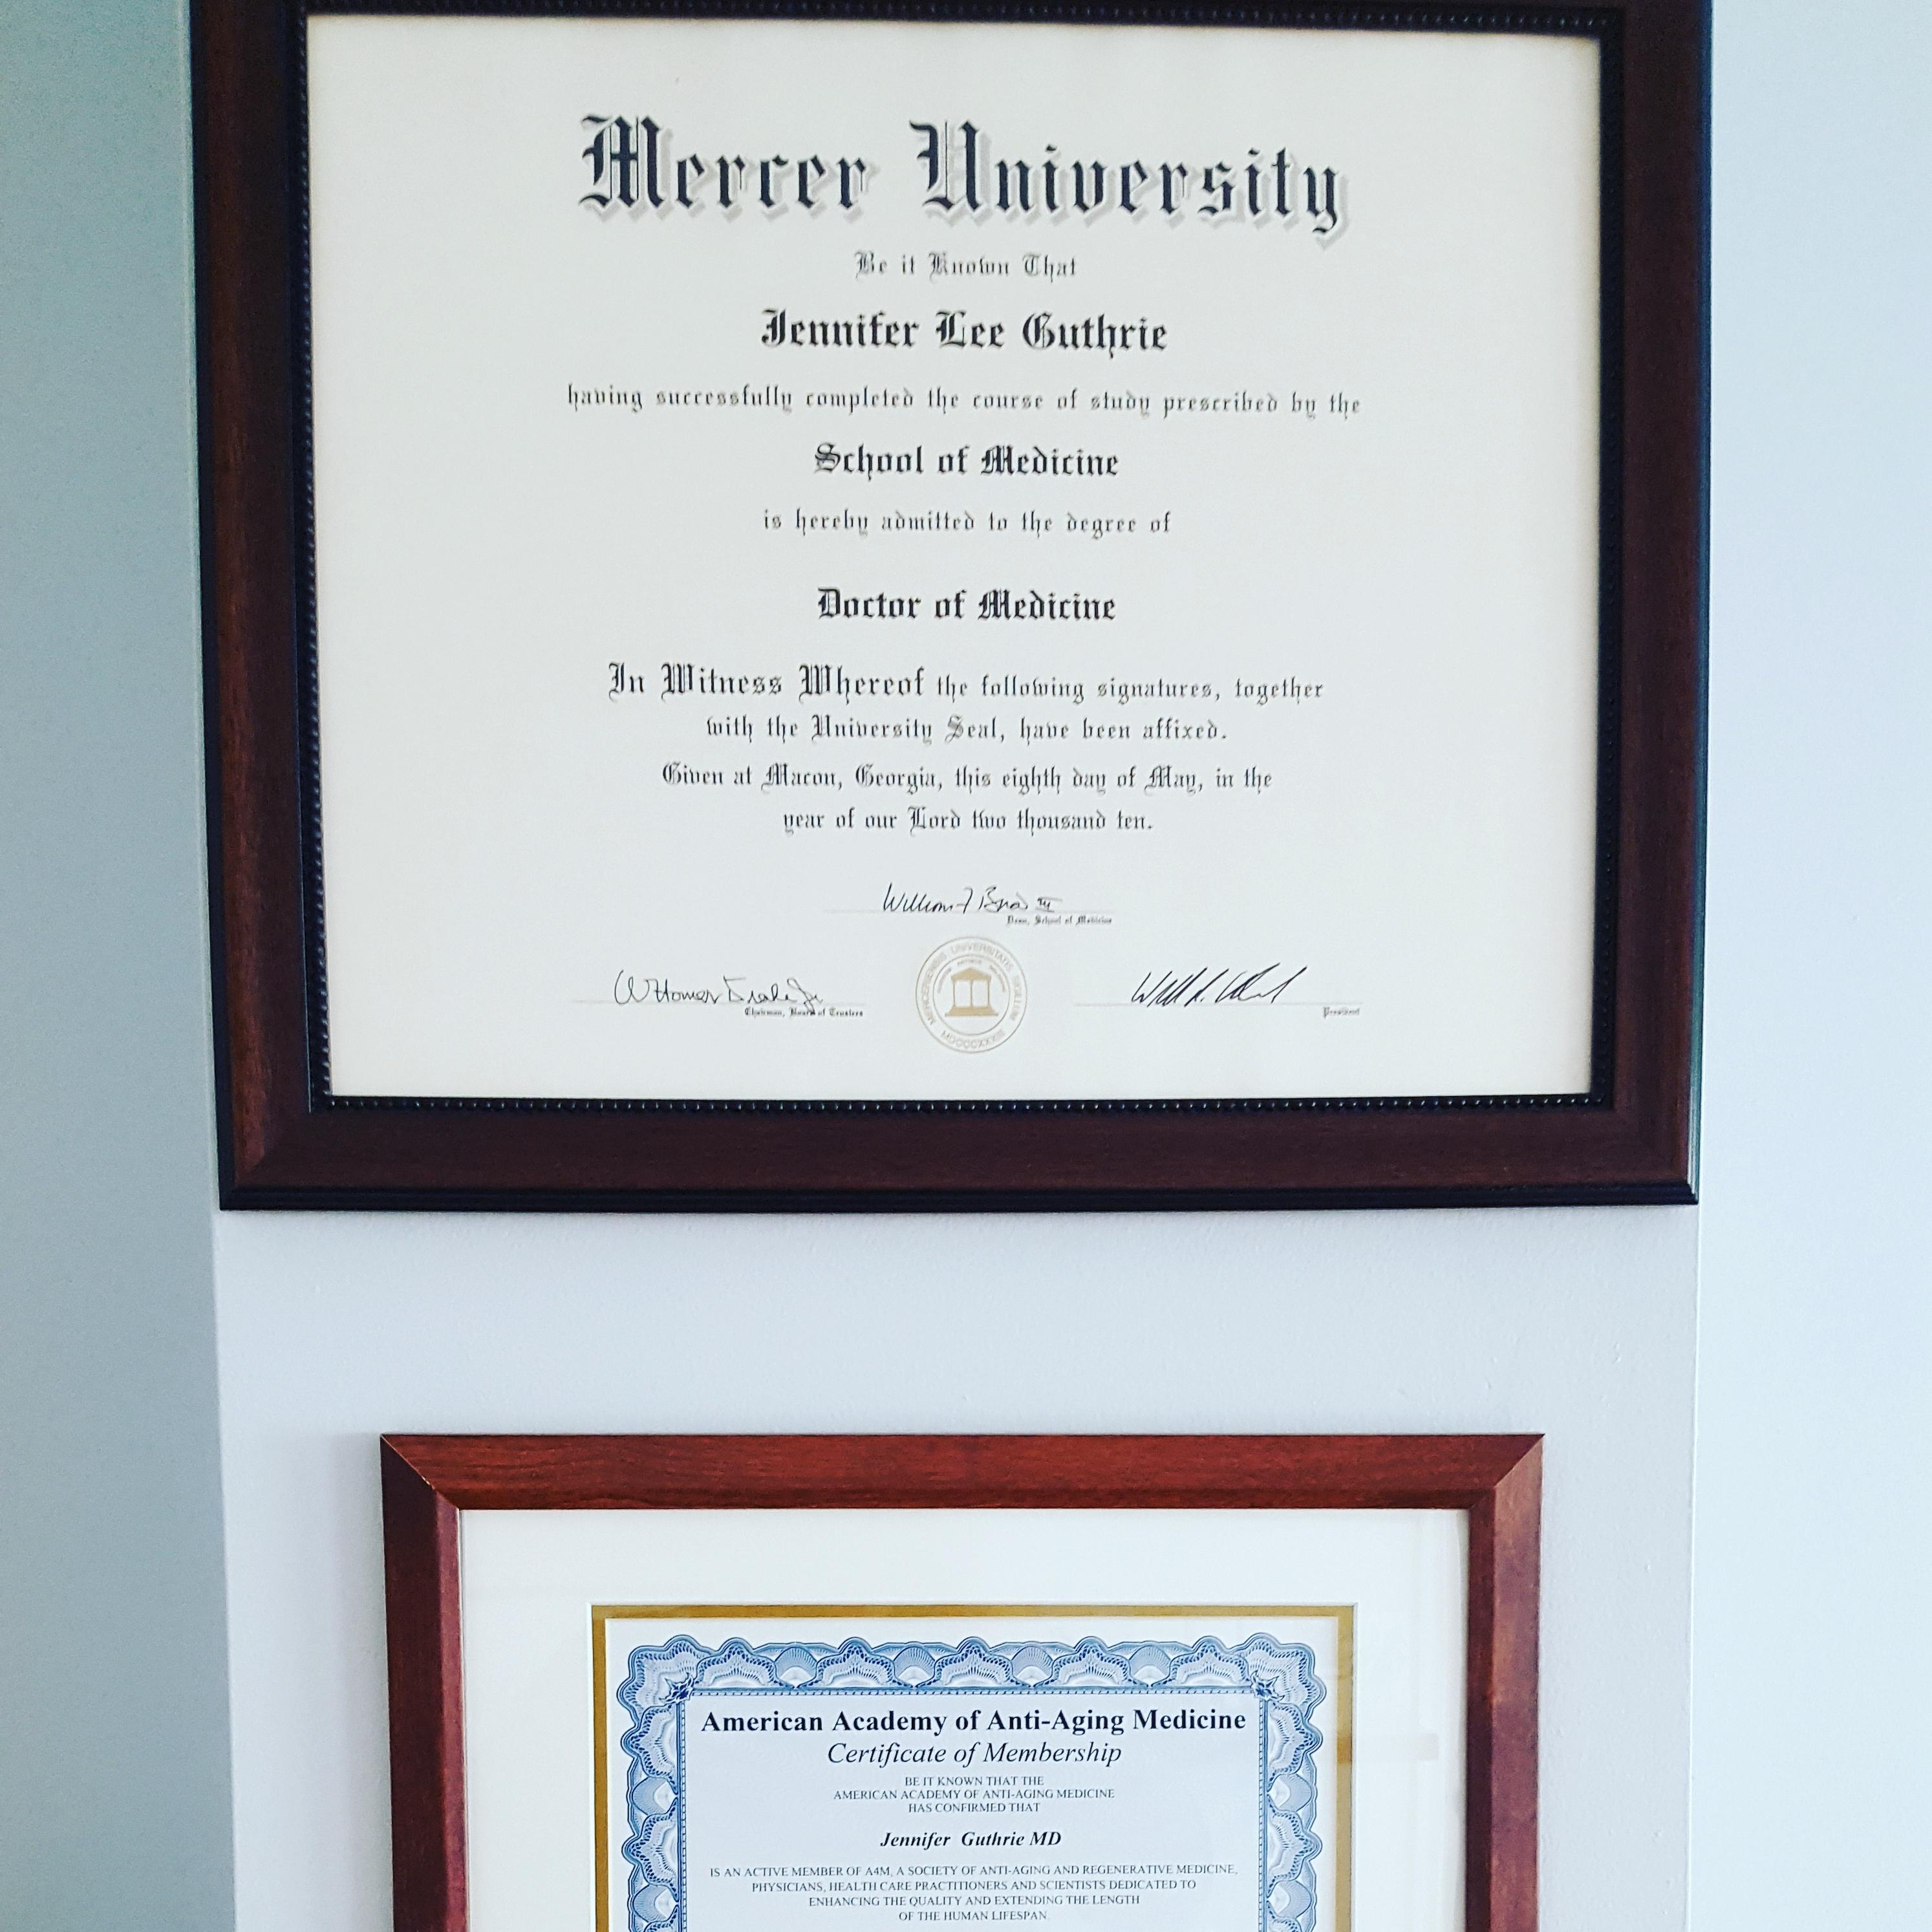 Mercer University of Medicine